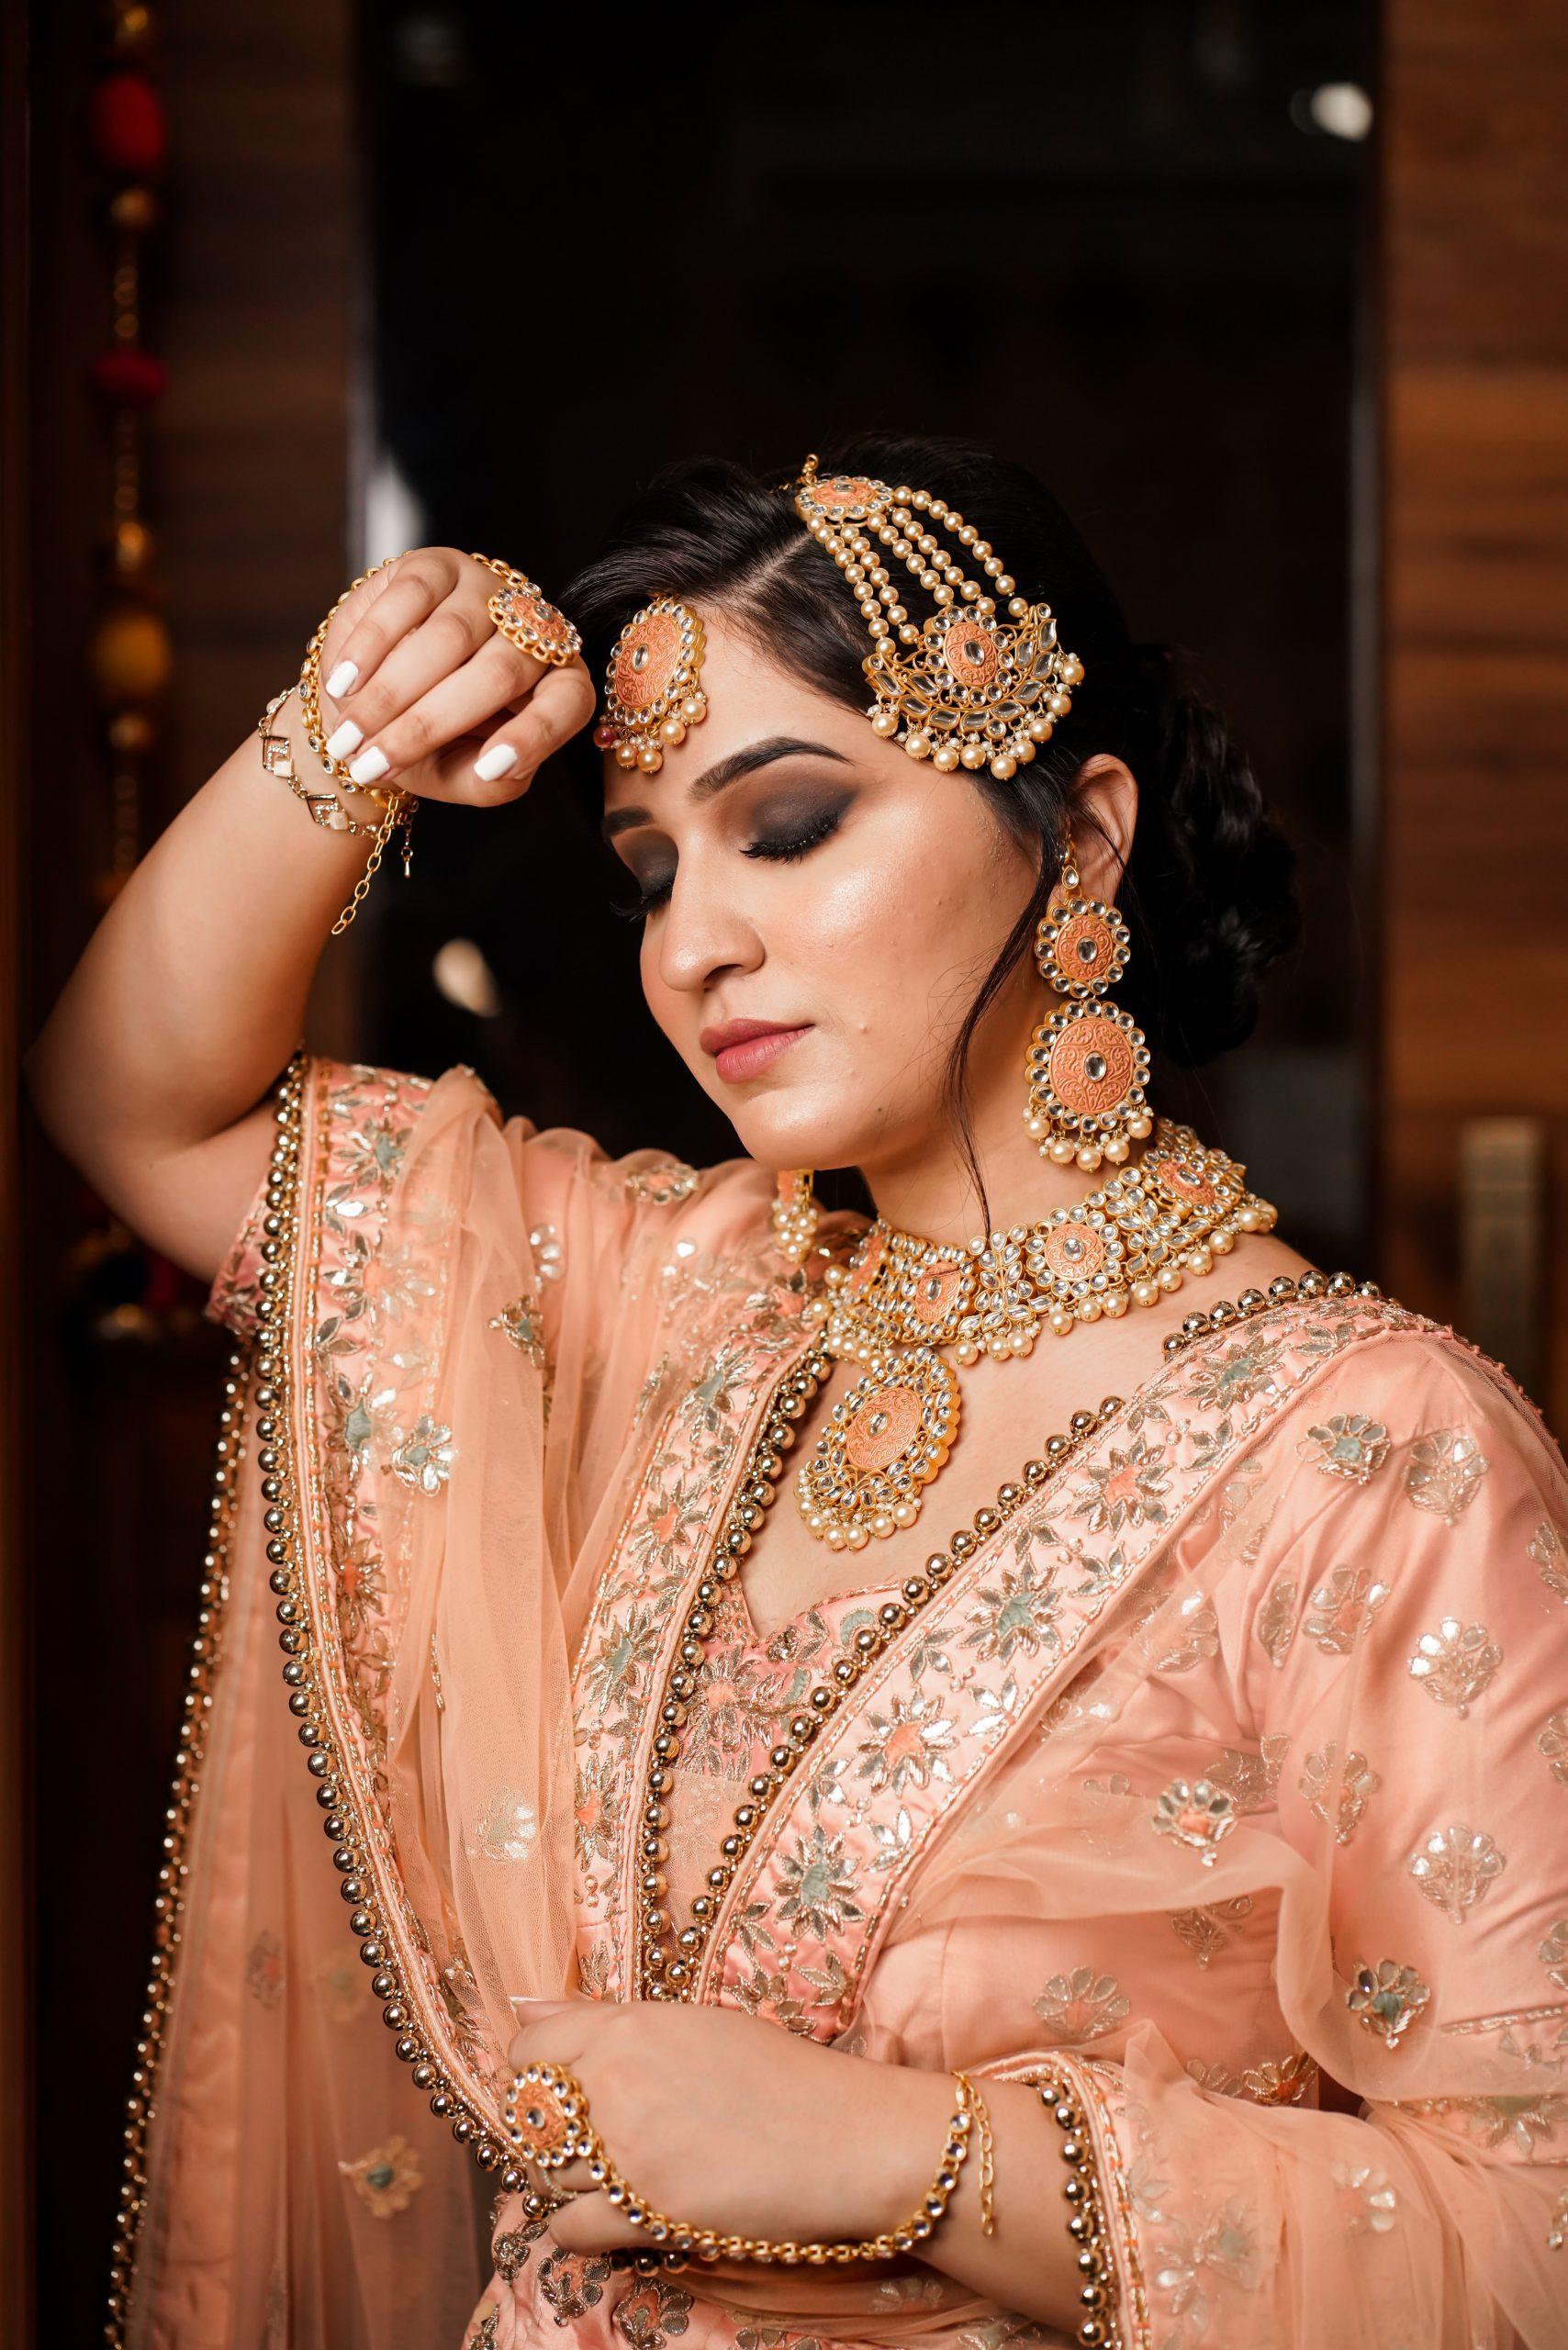 Indian Girl in Bridal Dress